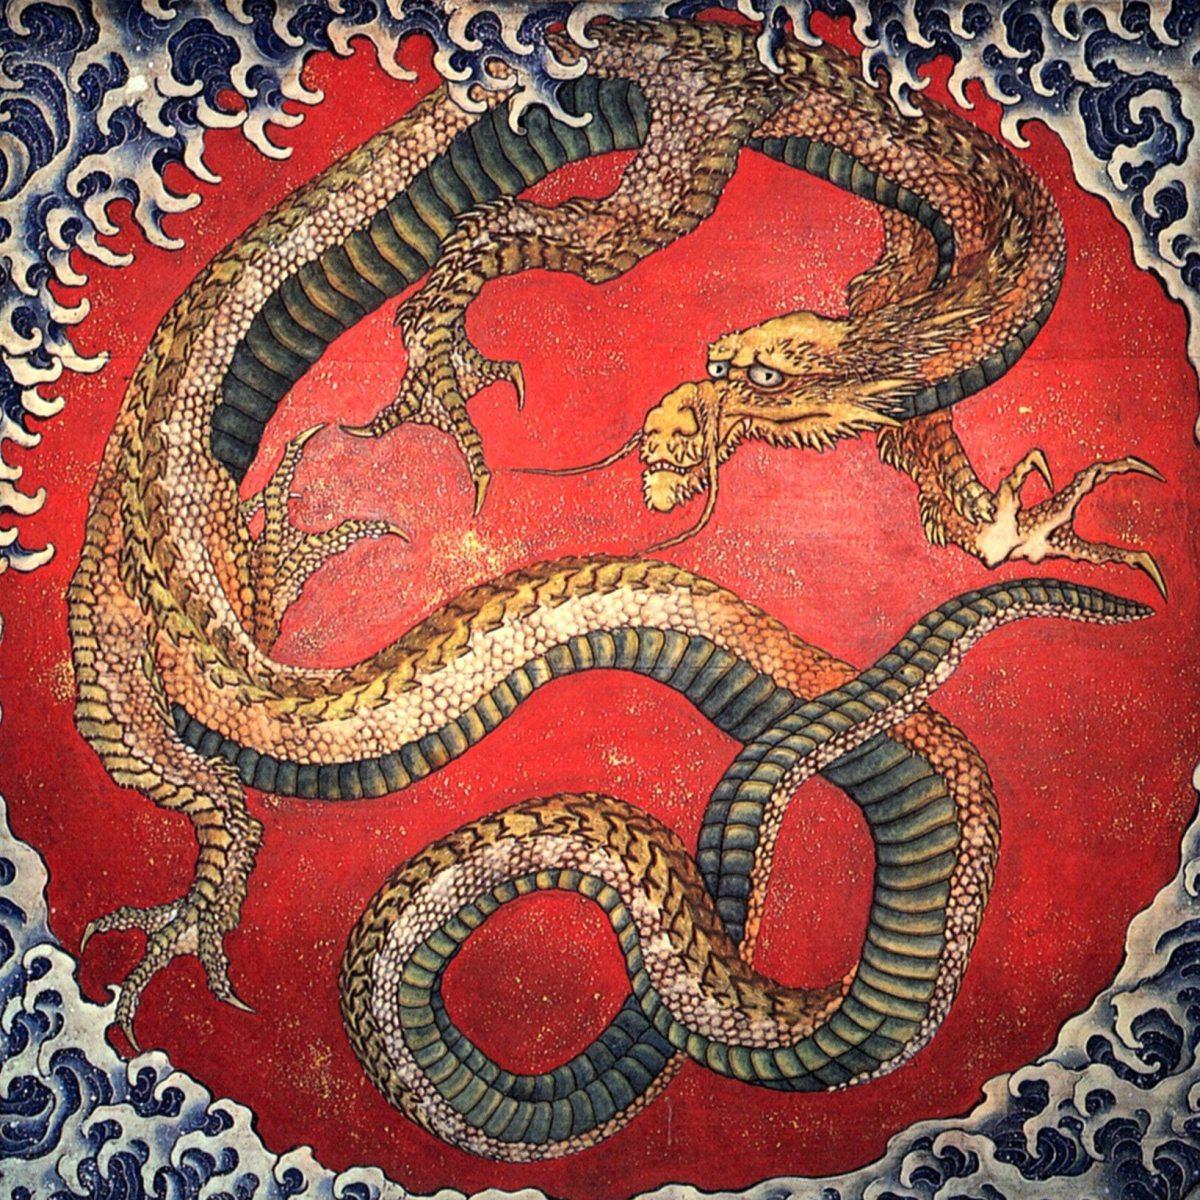 Painting of a Dragon by Katsushika Hokusai